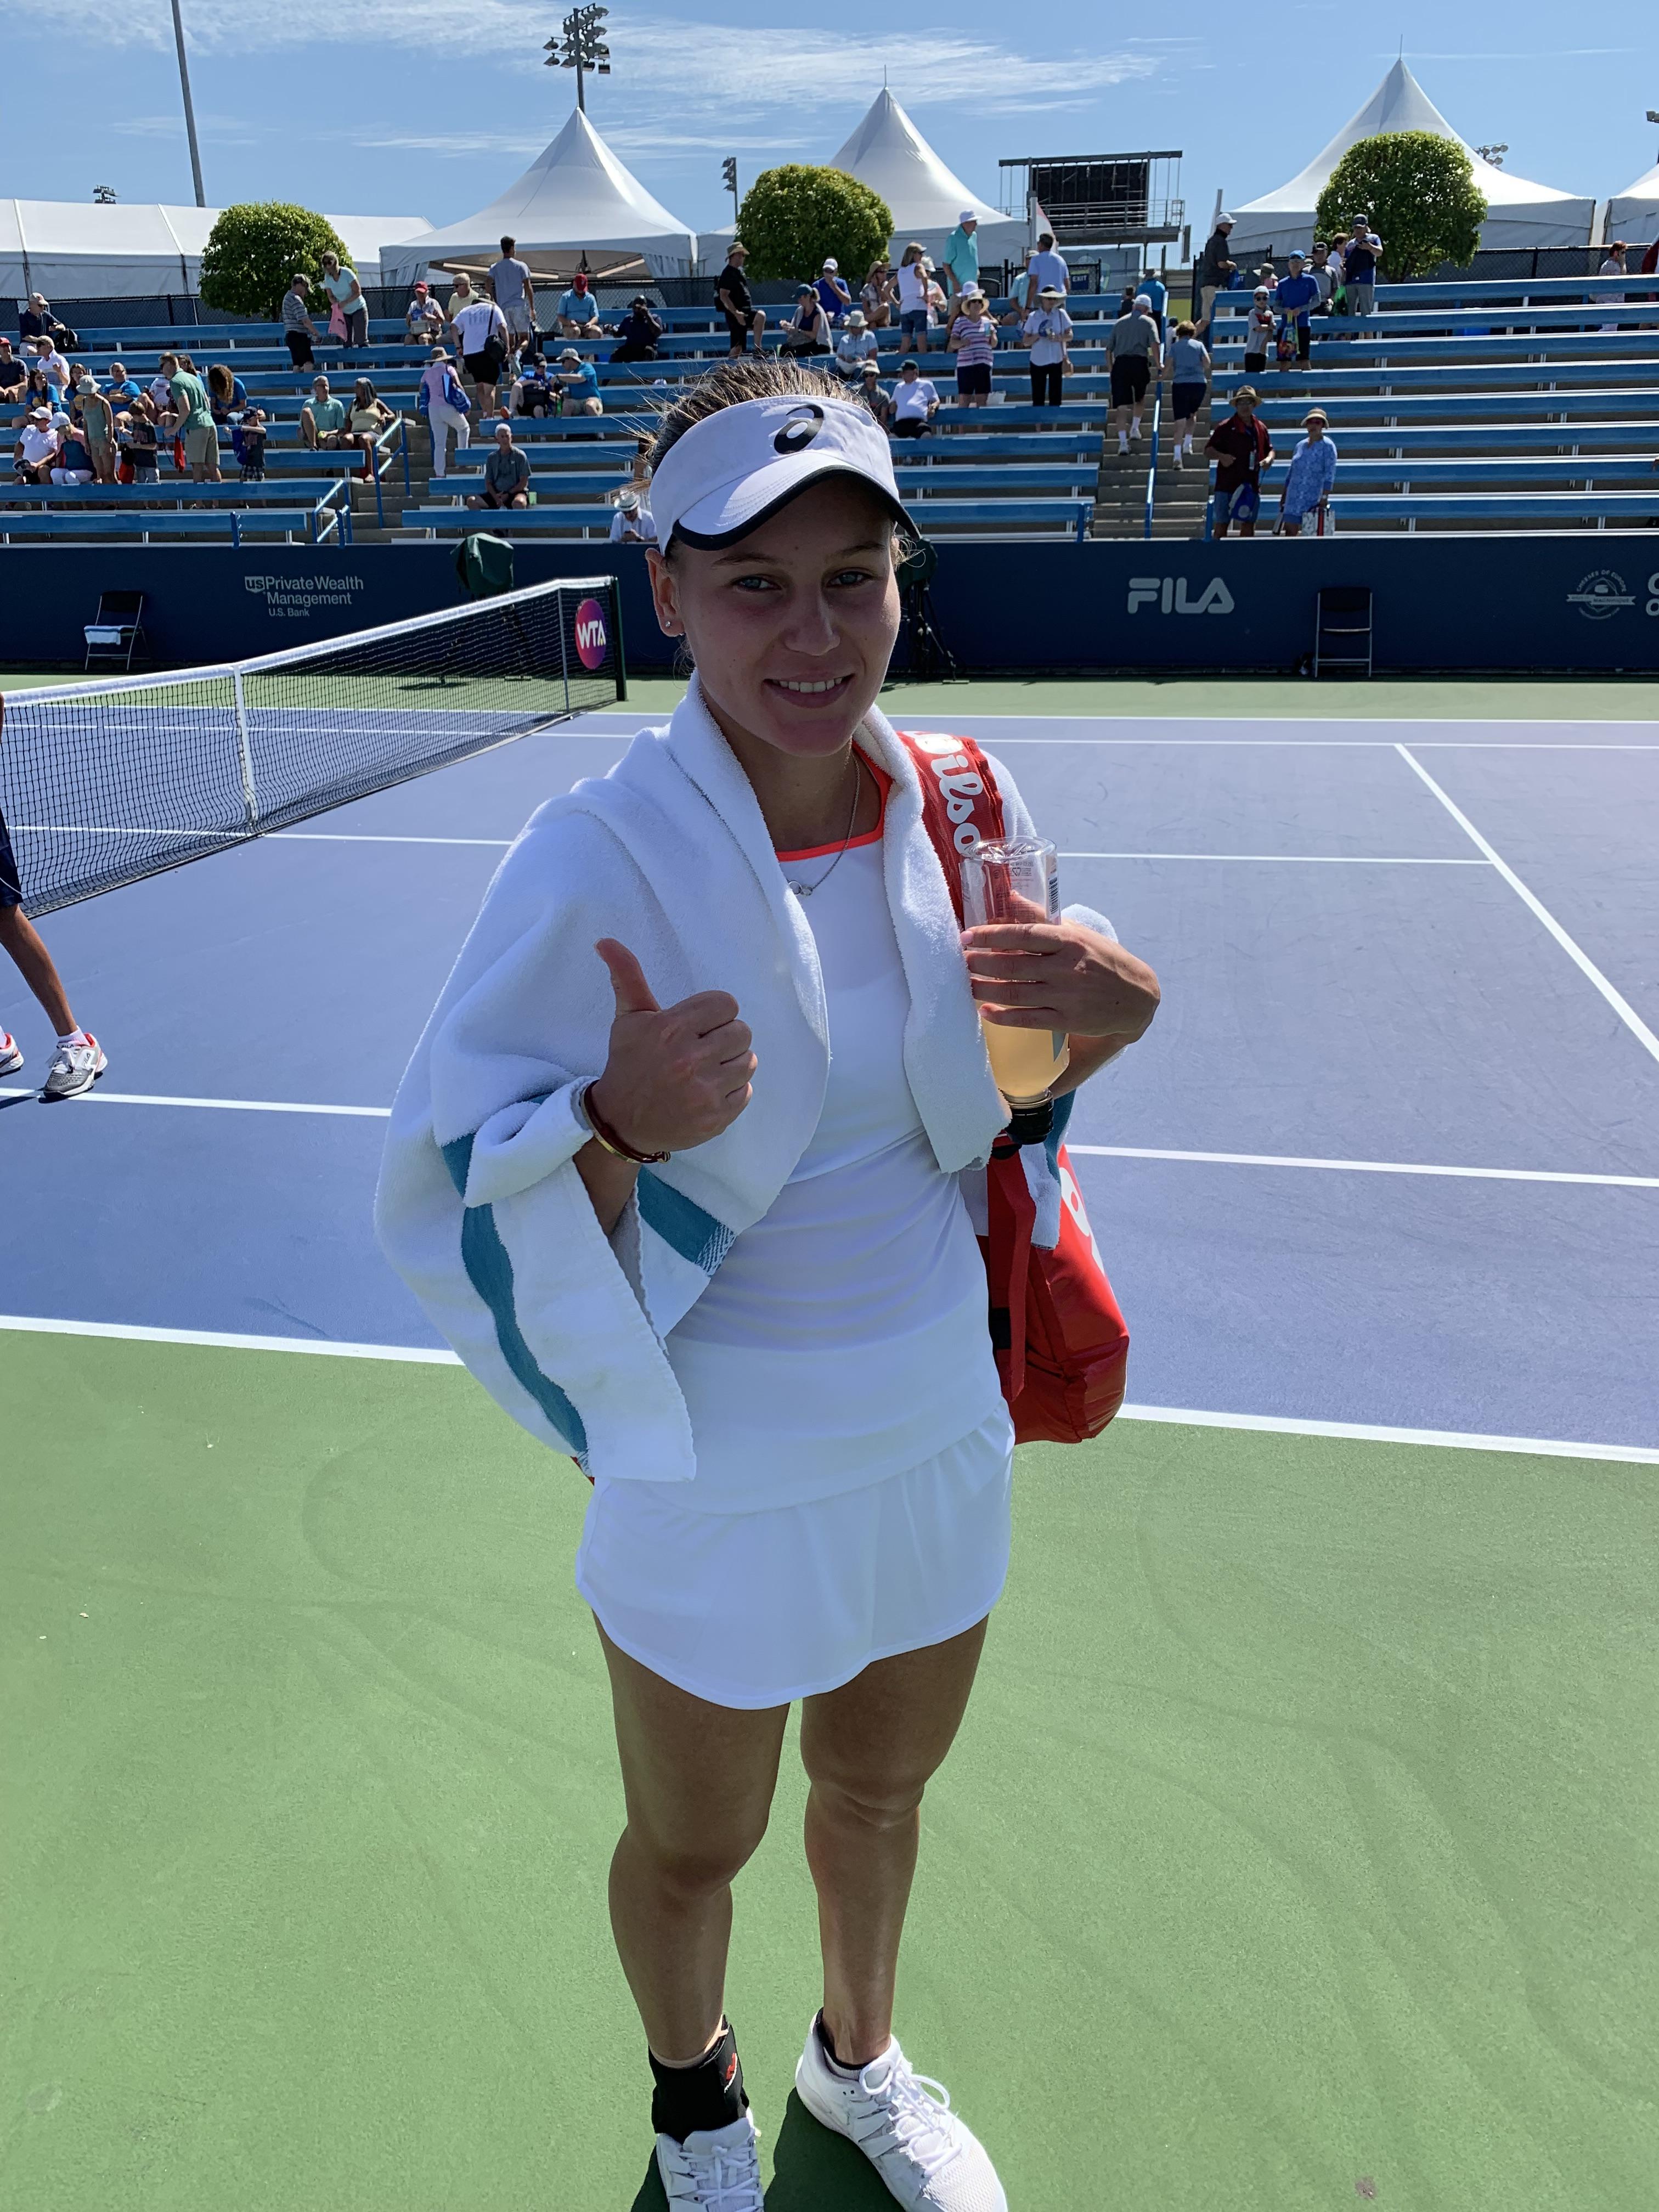 Veronika Kudermetova, 2019 Western & Southern Open (Photo: TennisAtlantic.com)